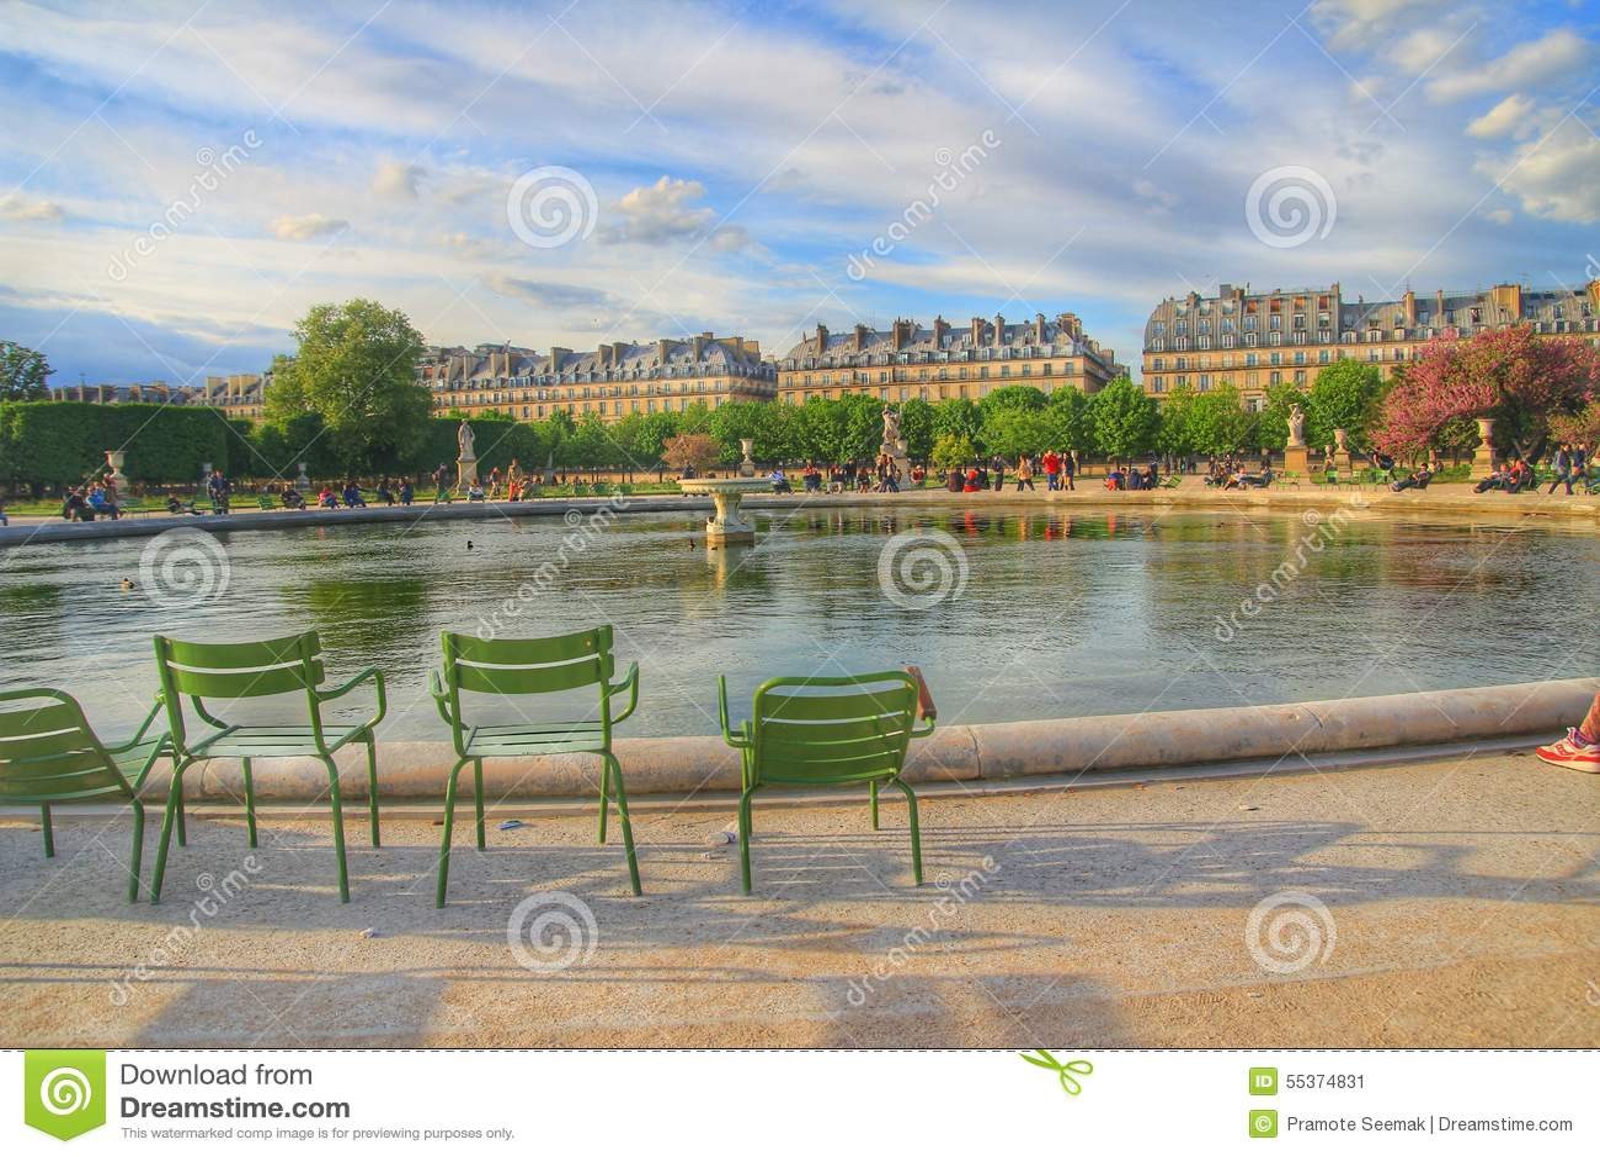 Jardin des tuileries paris france stock photo image for Jardin de france magnanville 78